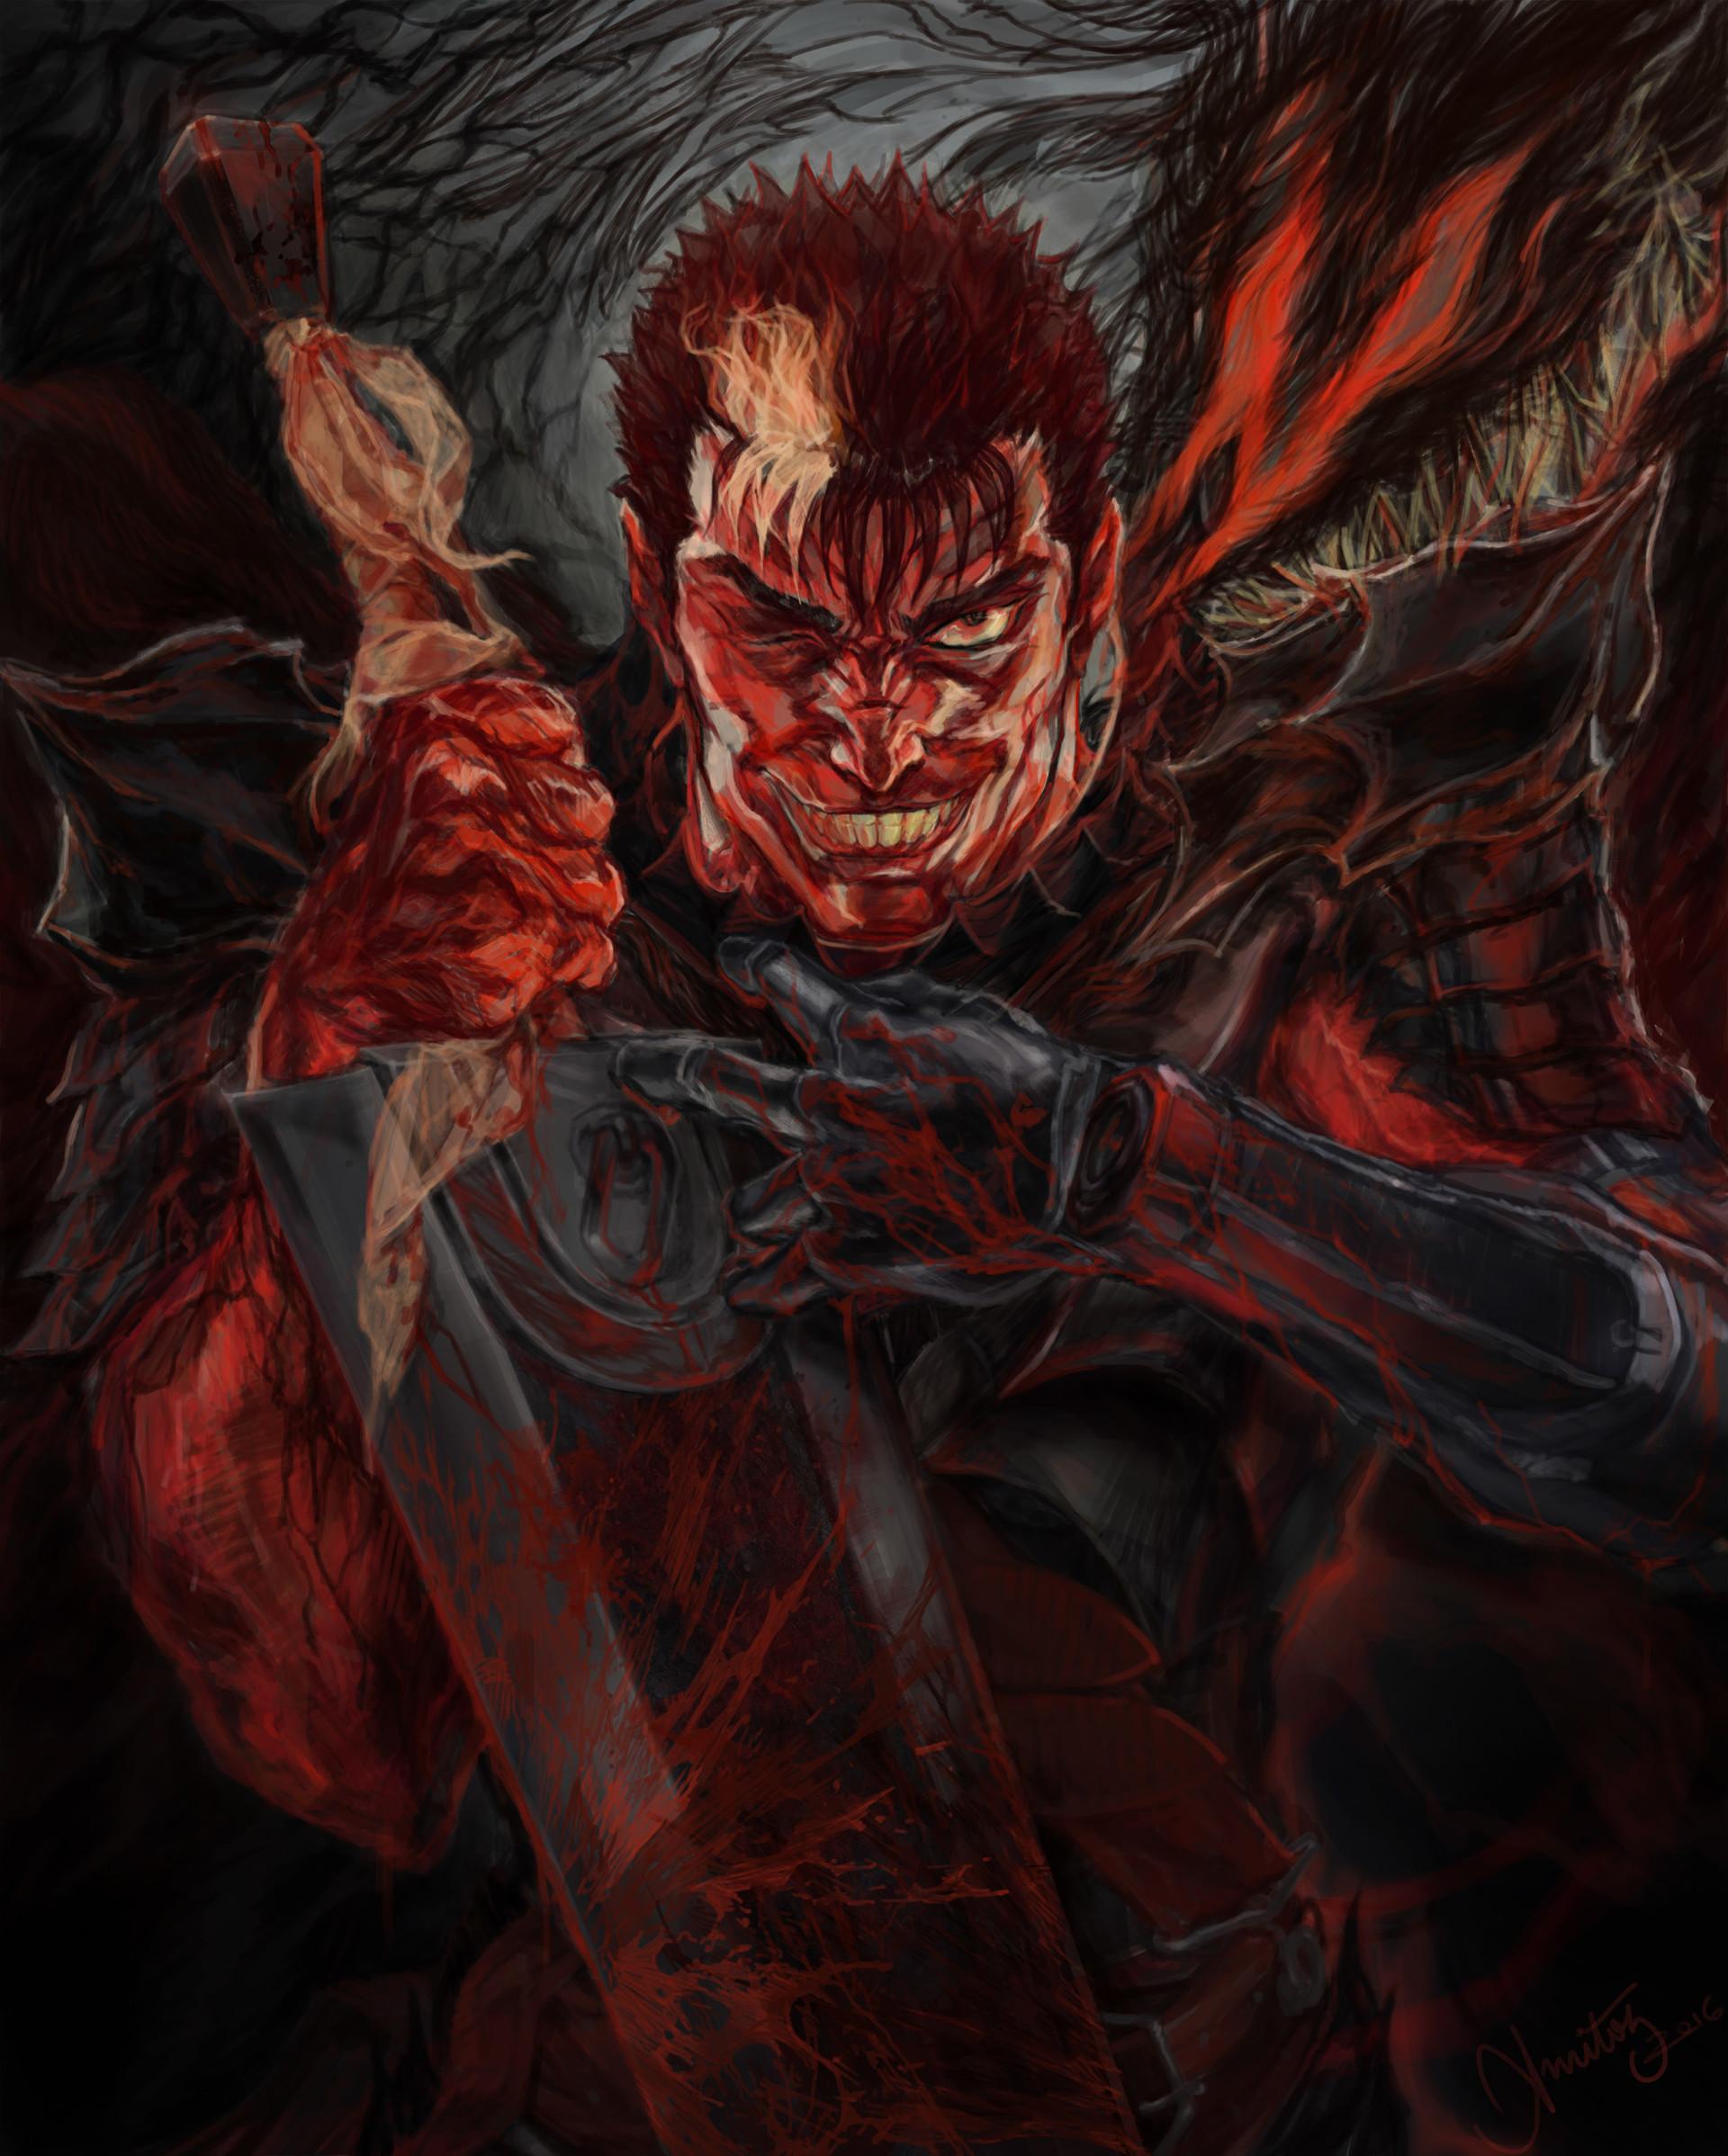 Just found this incredibly badass Guts fanart! : Berserk